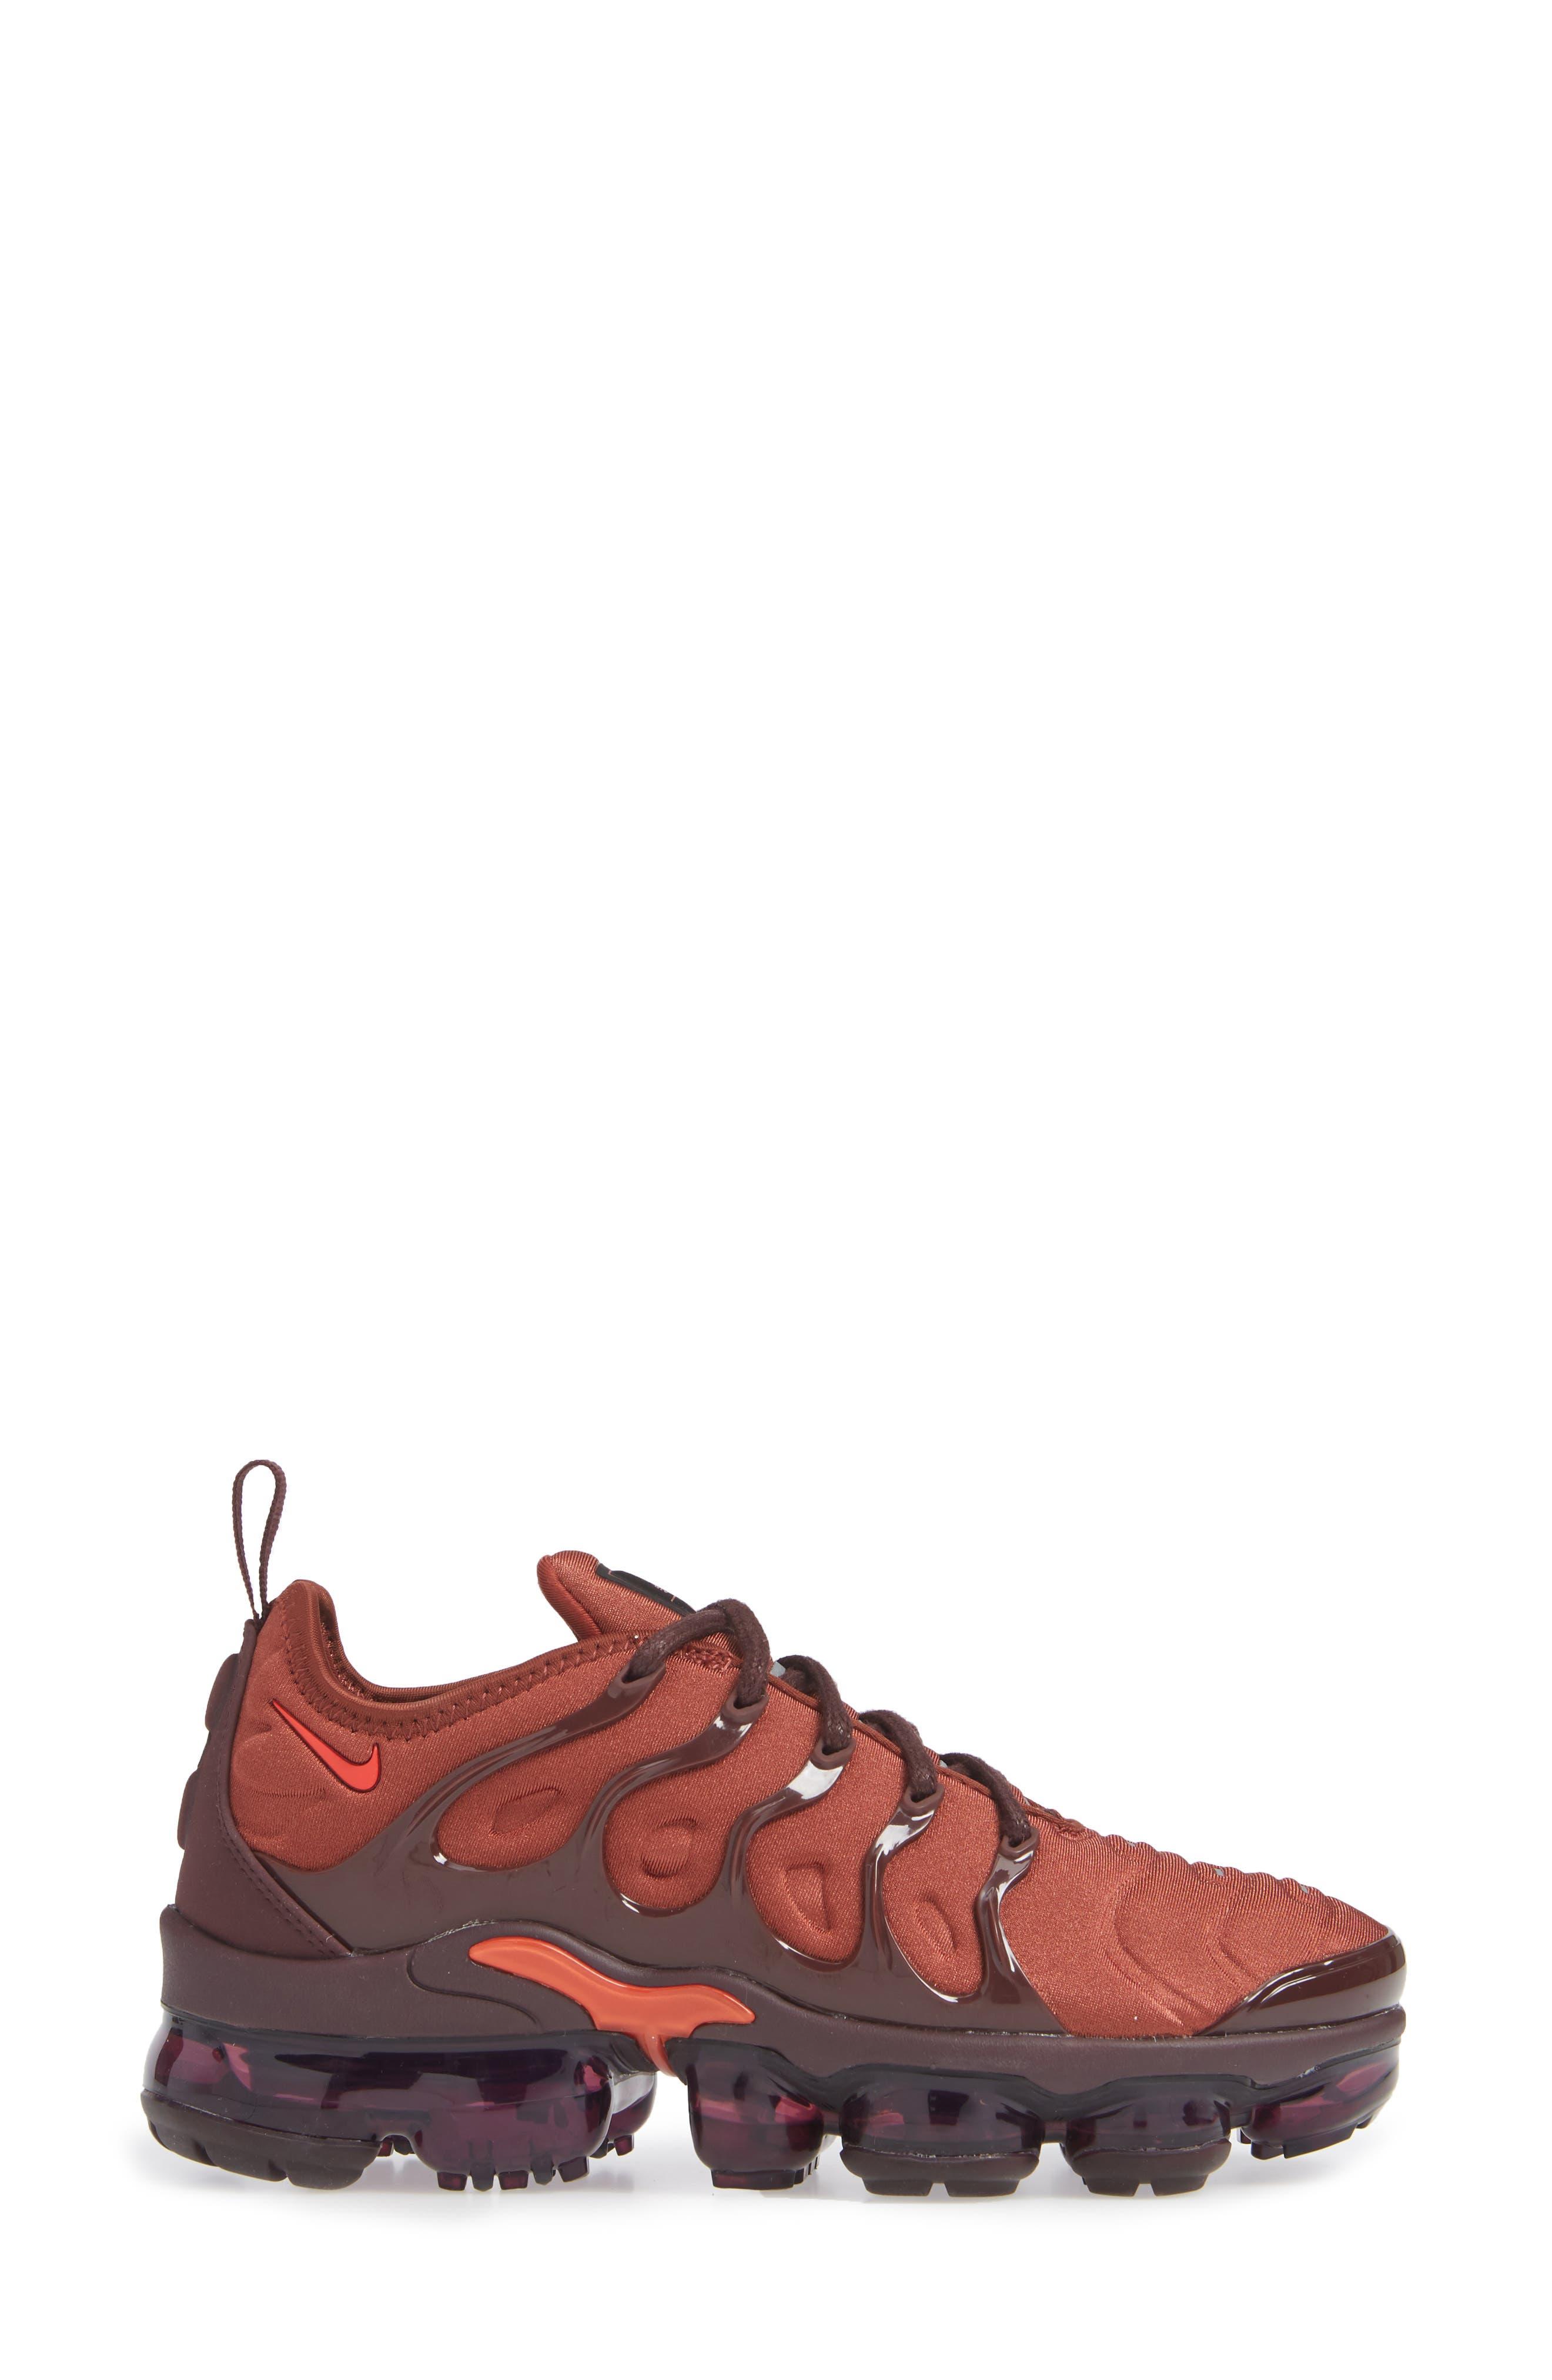 Air VaporMax Plus Sneaker,                             Alternate thumbnail 3, color,                             BURNT ORANGE/ RED-BURGUNDY